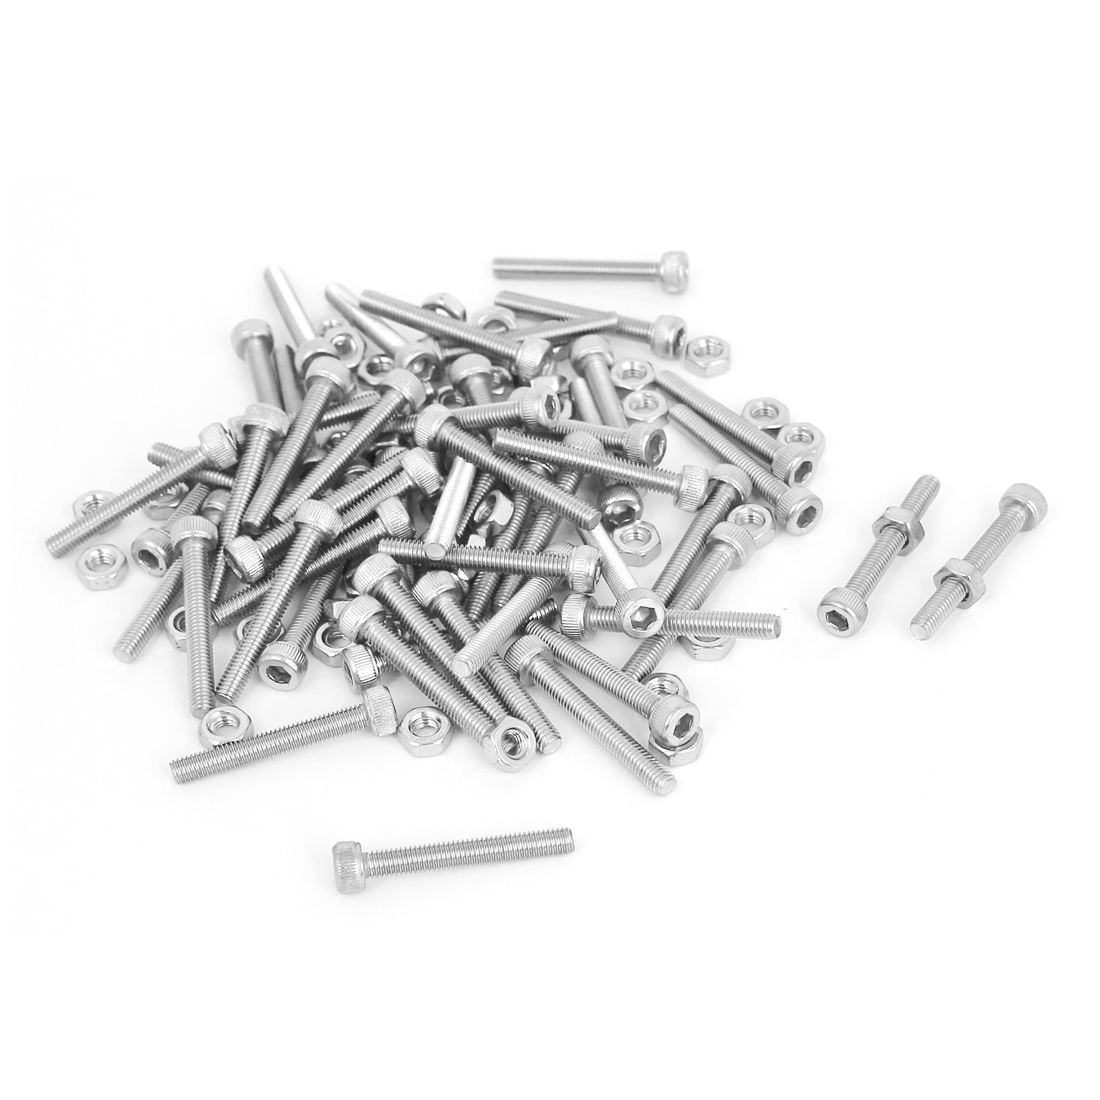 M3x22mm Stainless Steel Hex Socket Head Knurled Cap Screws Bolts Nut Set 50Pcs